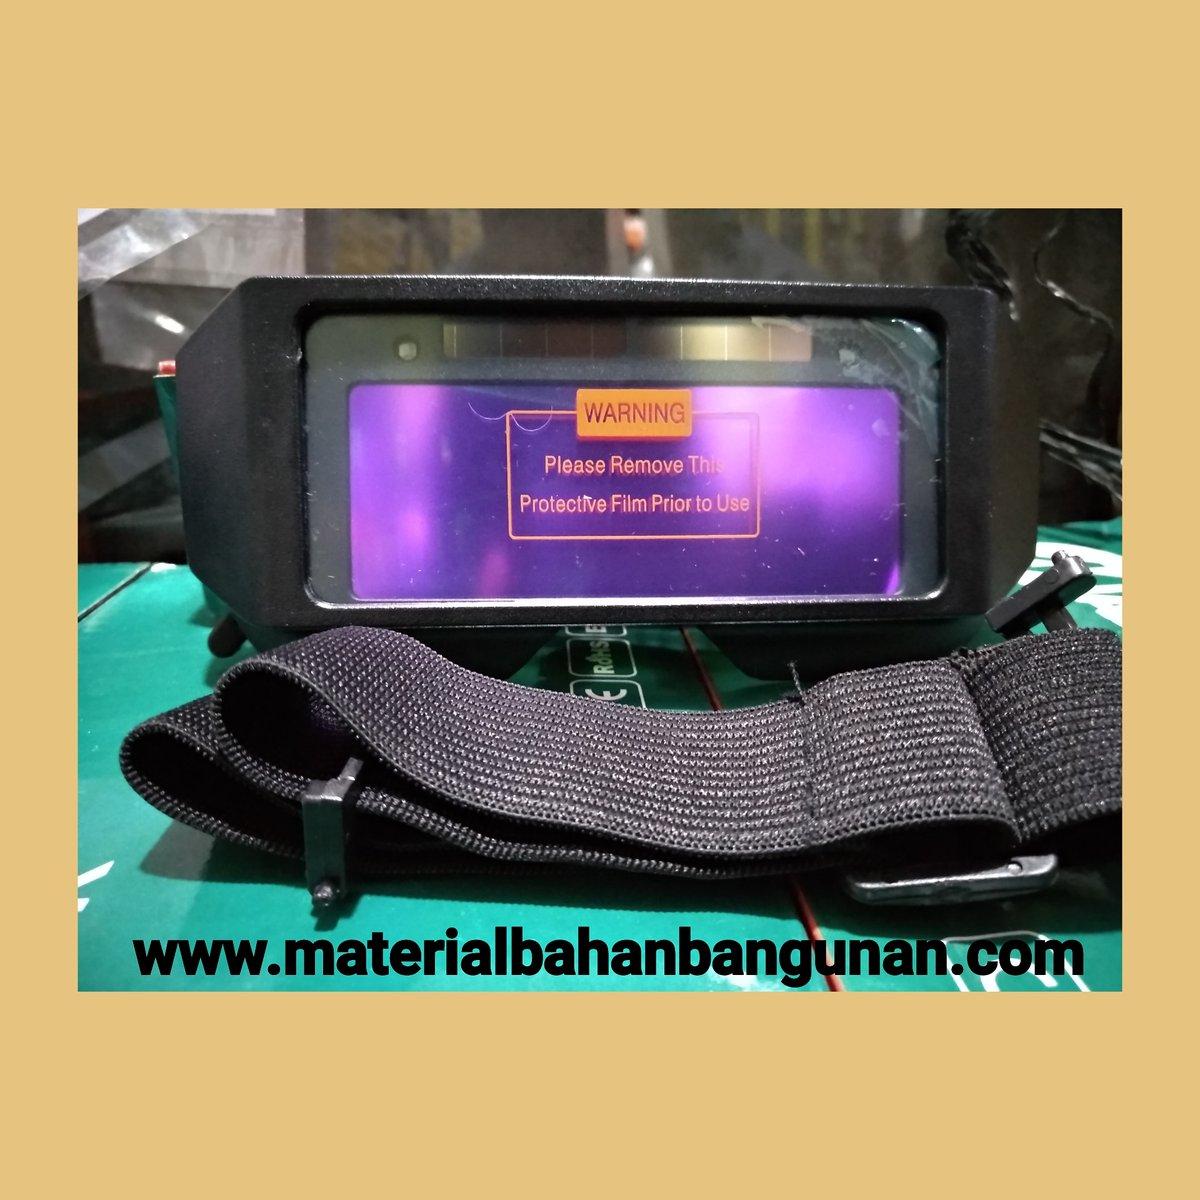 kacamata las   Chat Whatsapp 085710032801   http://www.materialbahanbangunan.com    #dirumahaja #virus #Depok #proyek #industri #konstruksi #proyekbangunan #engineering #bangunan #alatteknik #jualkacamatalas #jualalatlaspic.twitter.com/95jBMMXsZK